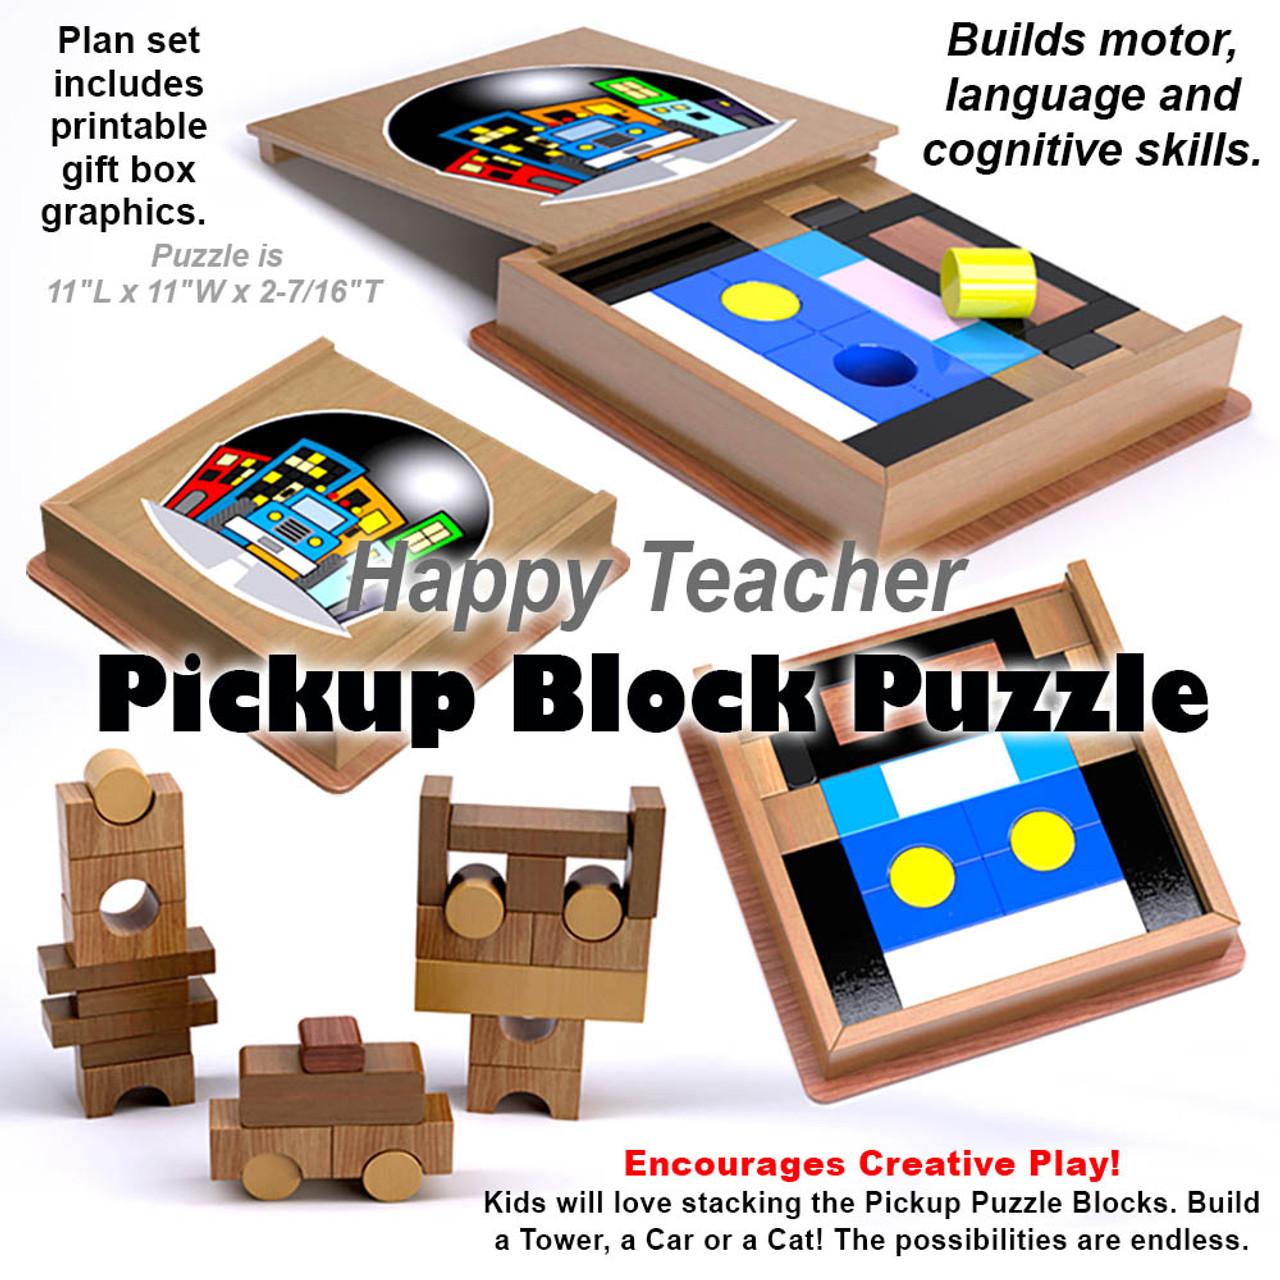 Happy Teacher Pickup Truck Block Puzzle Wood Toy Plans (PDF Download)